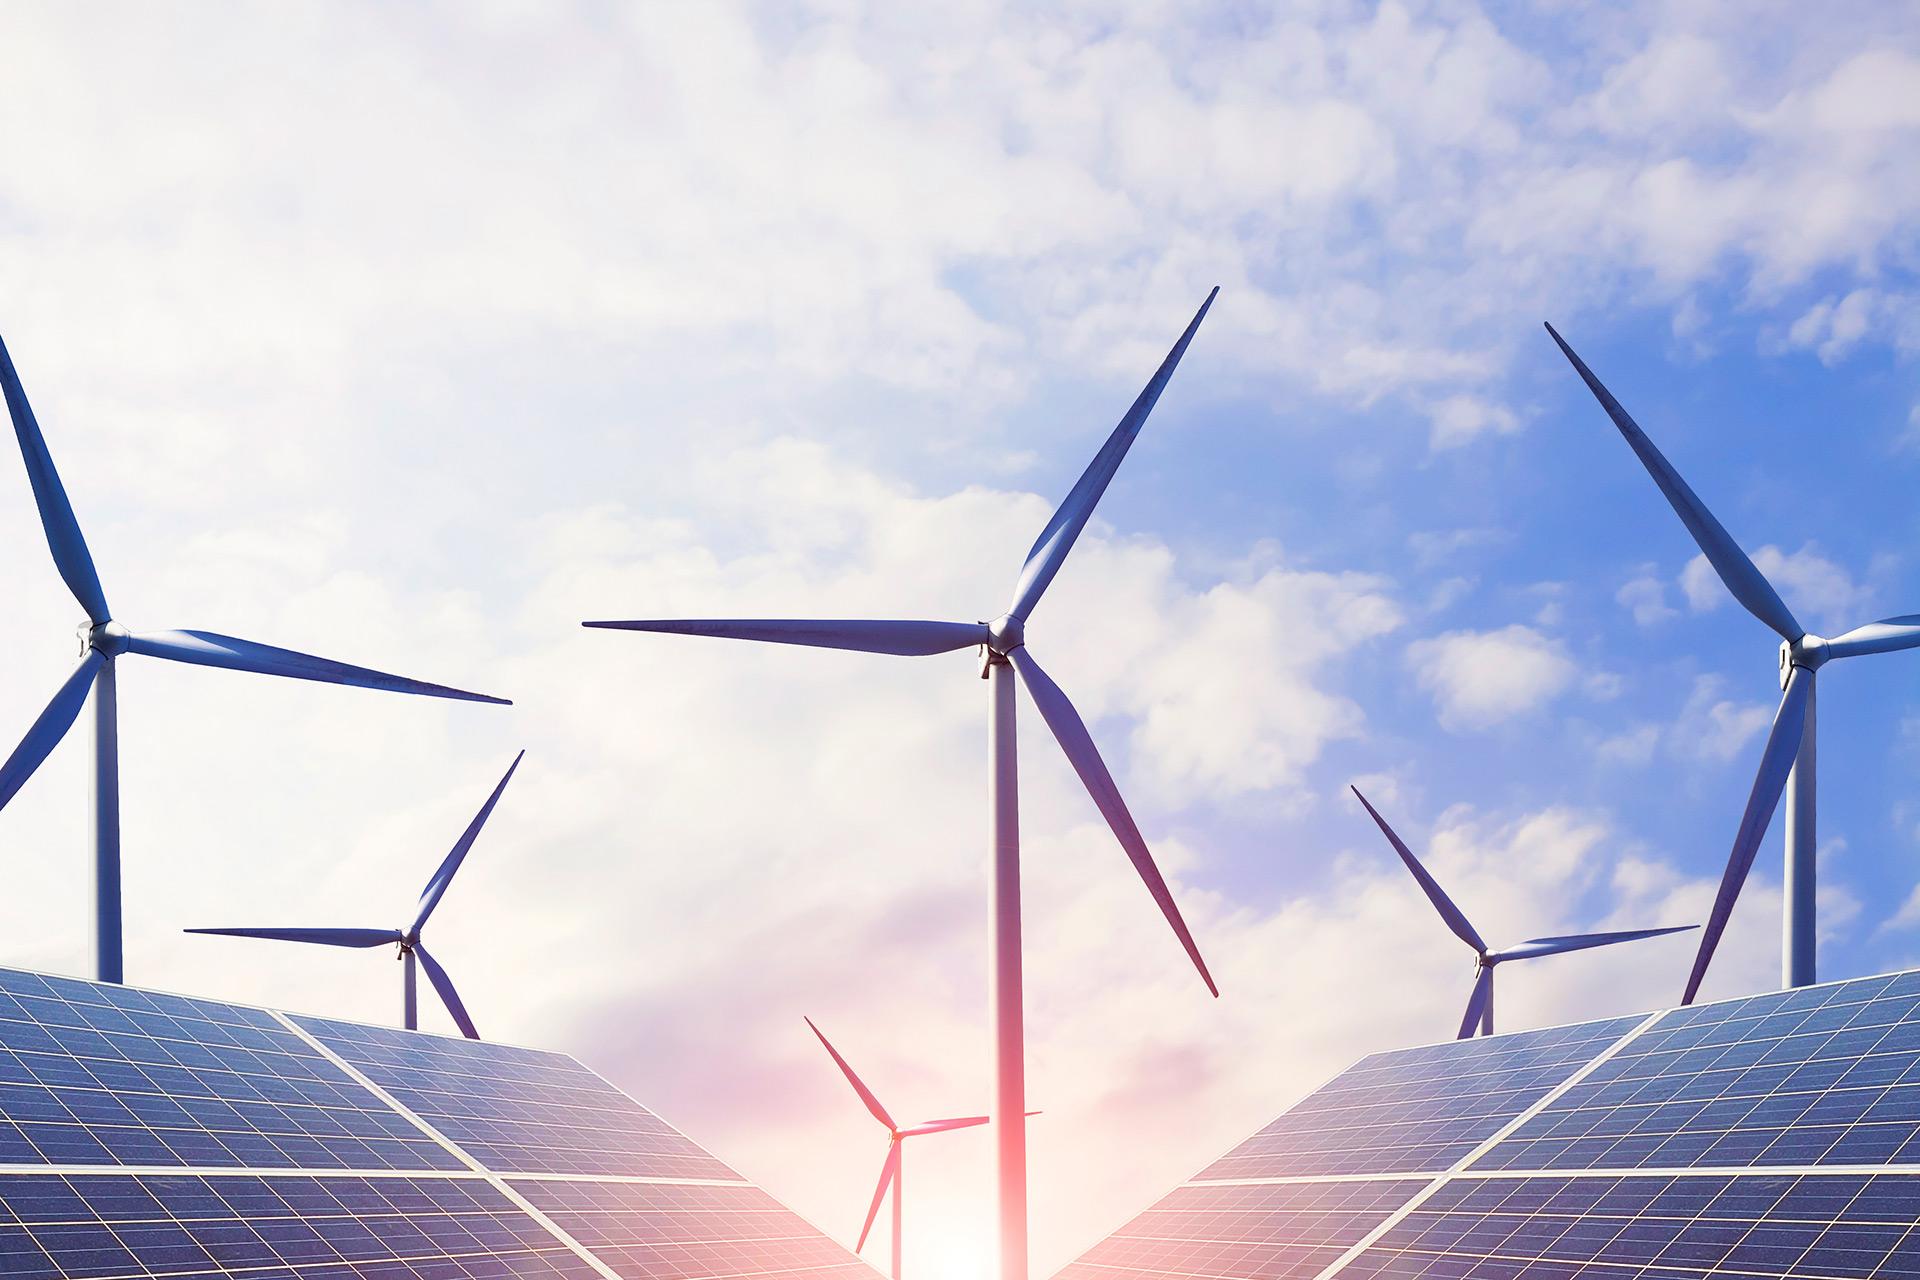 Erneuerbare-Energien_Windrad_Solar-batch-1